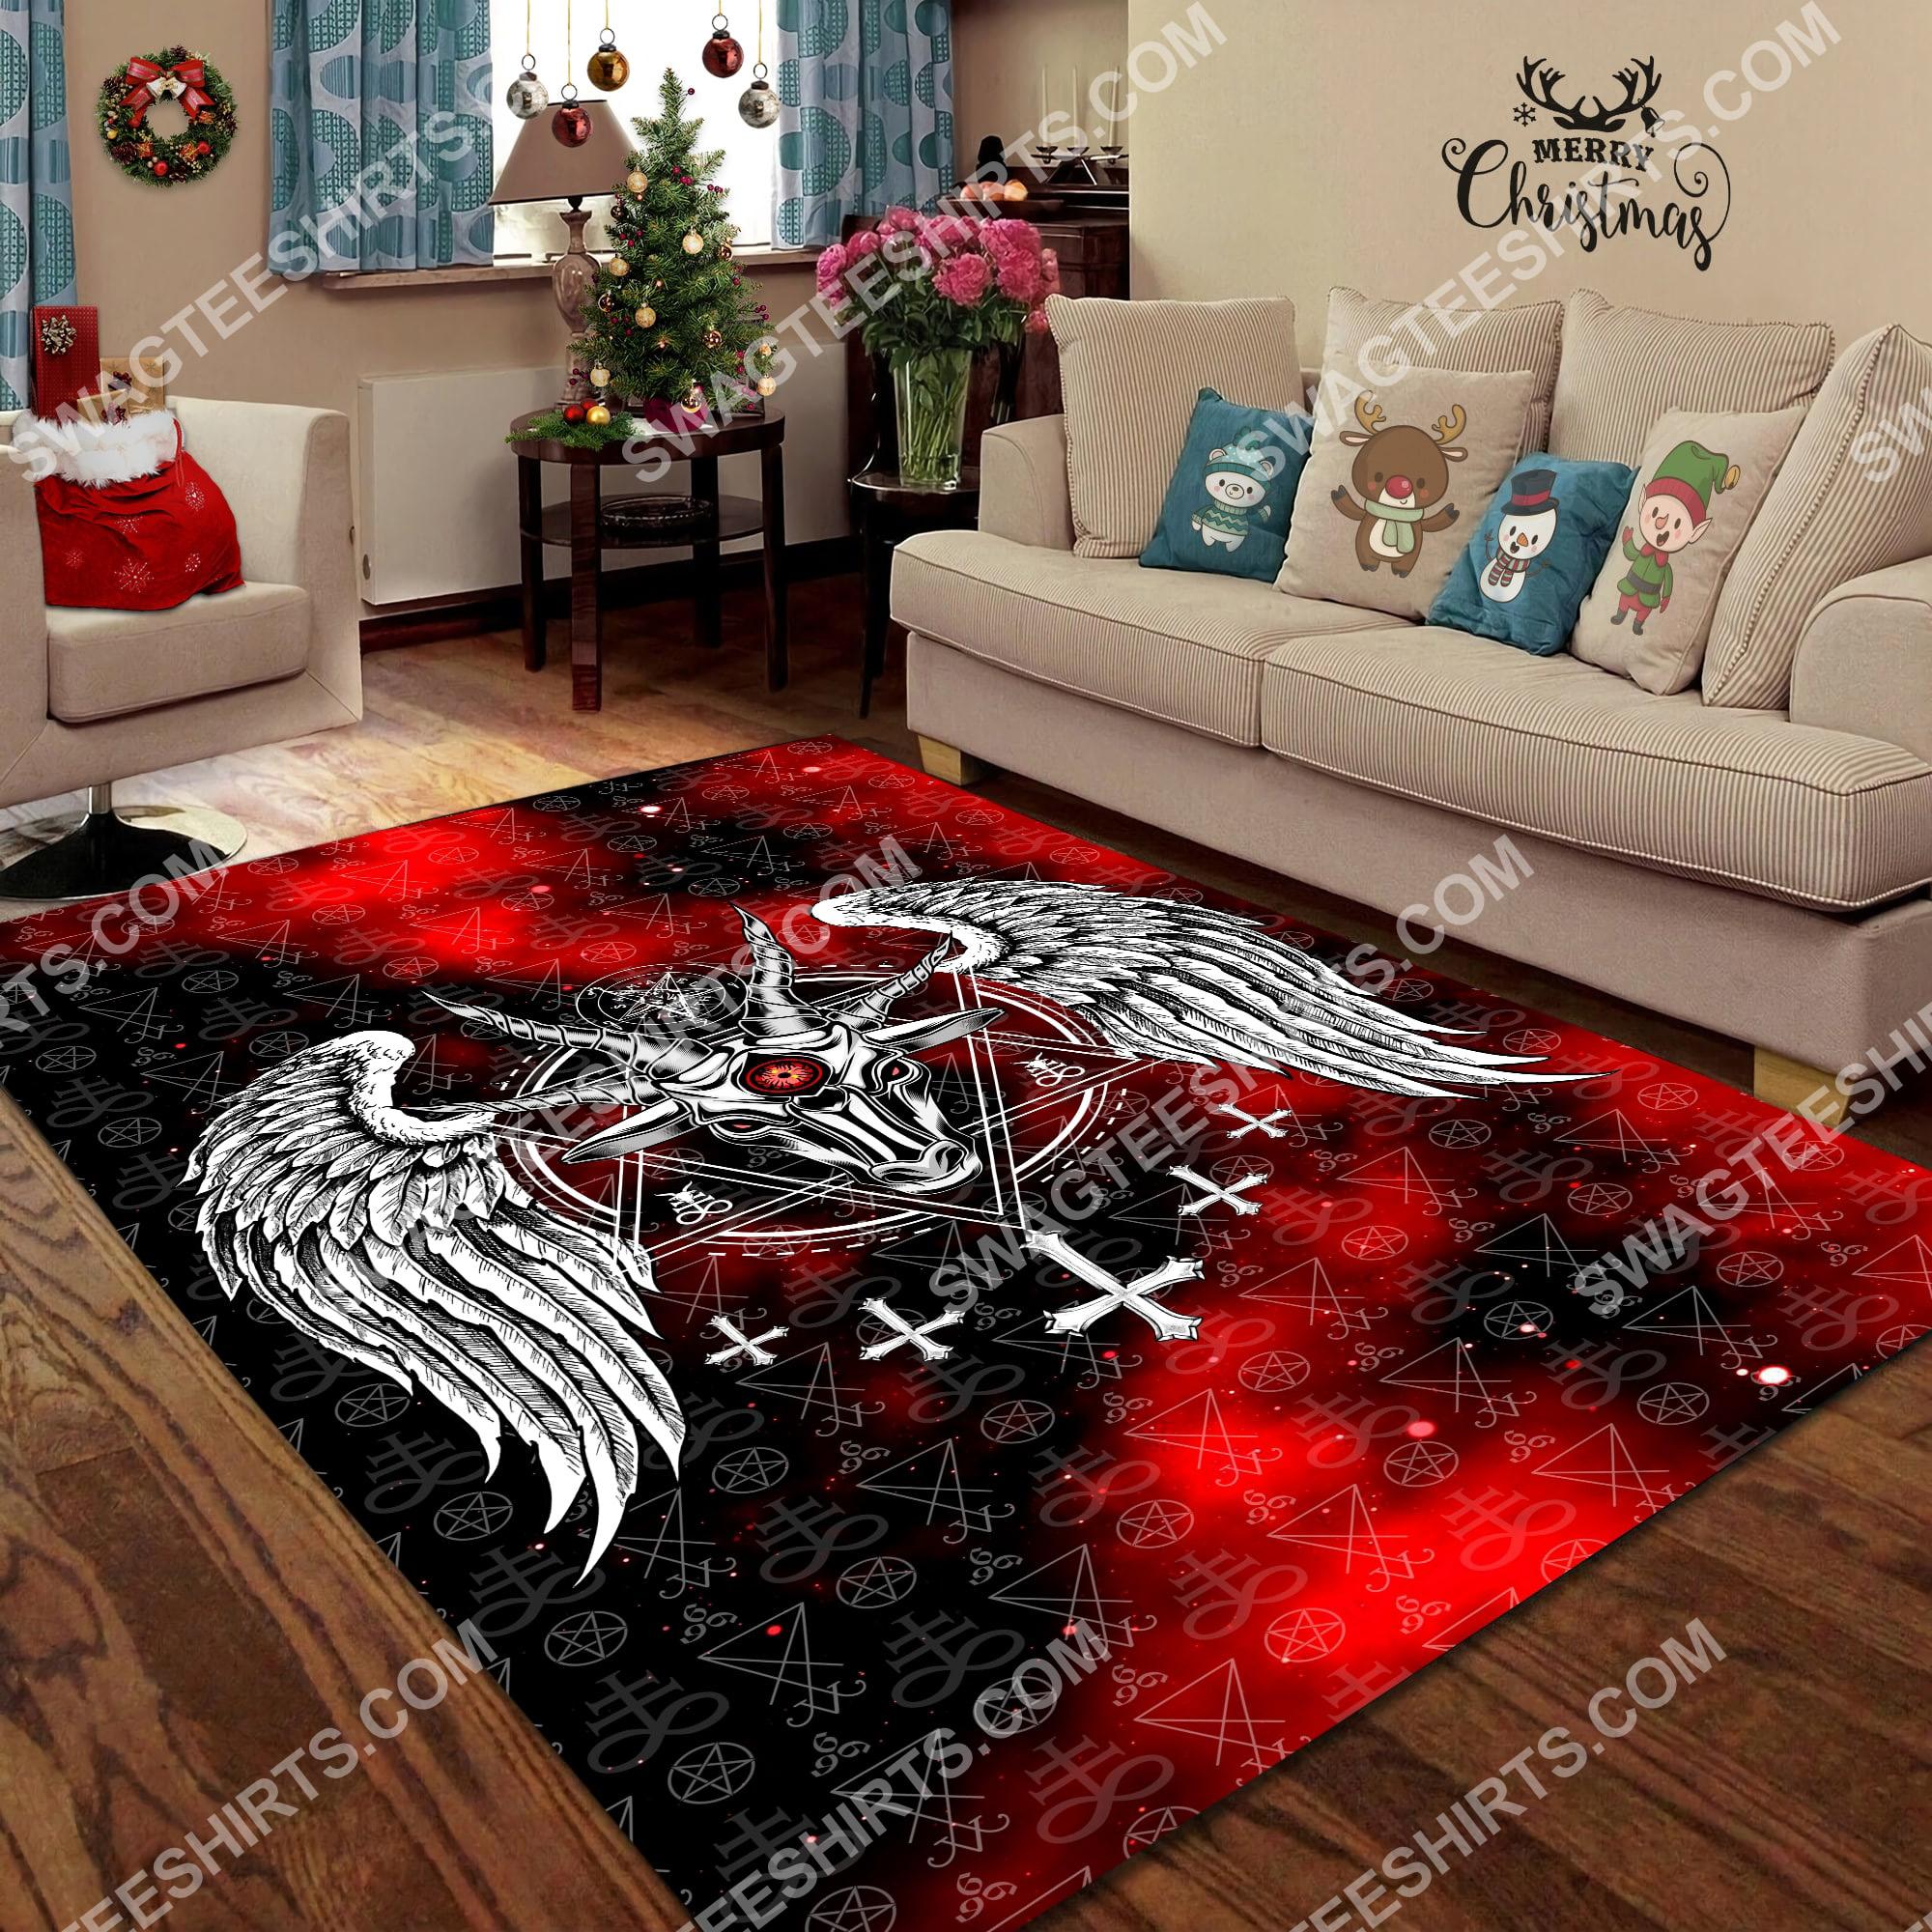 the satanic symbol all over printed rug 2(1)